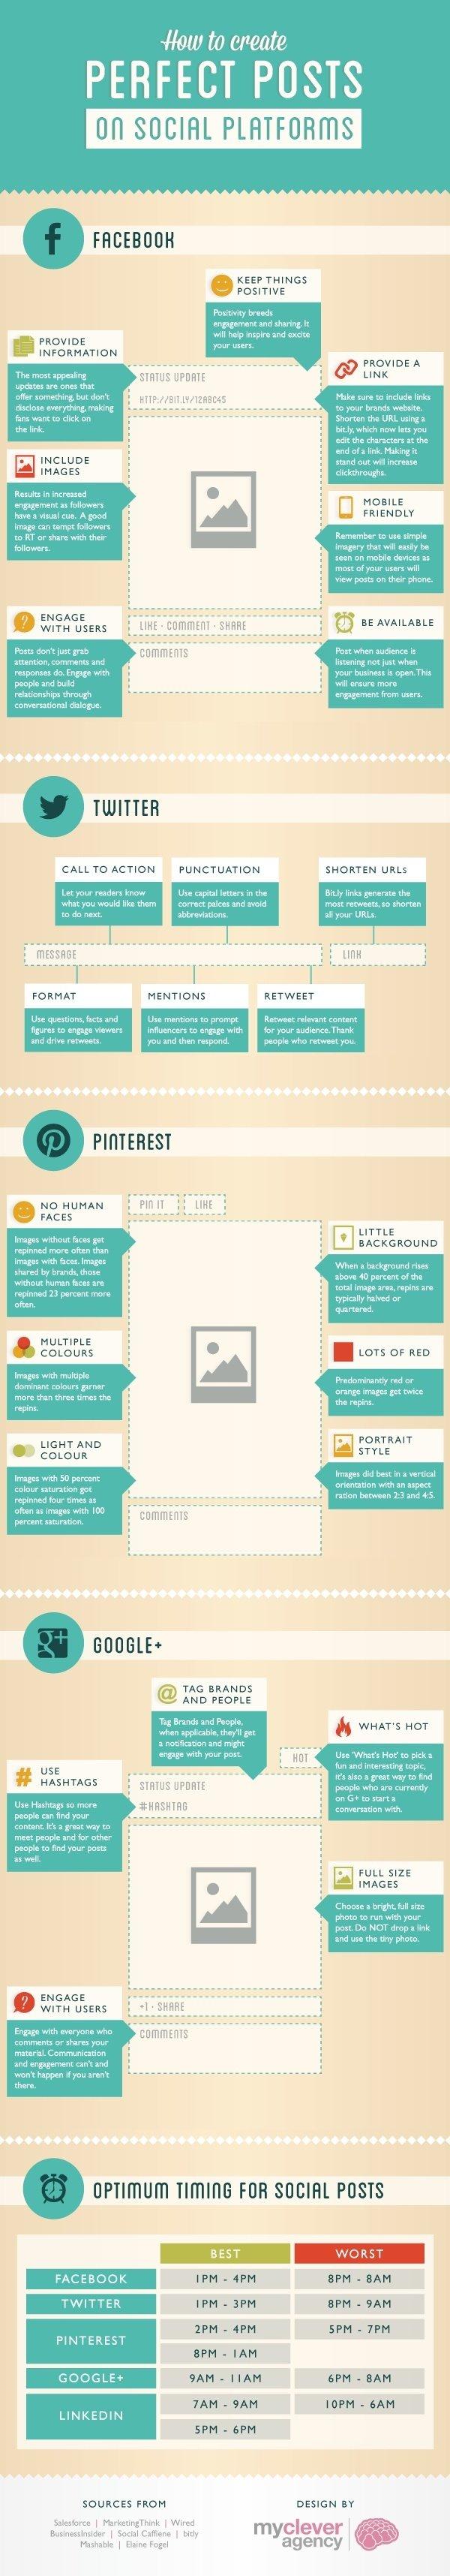 post_redes_sociales